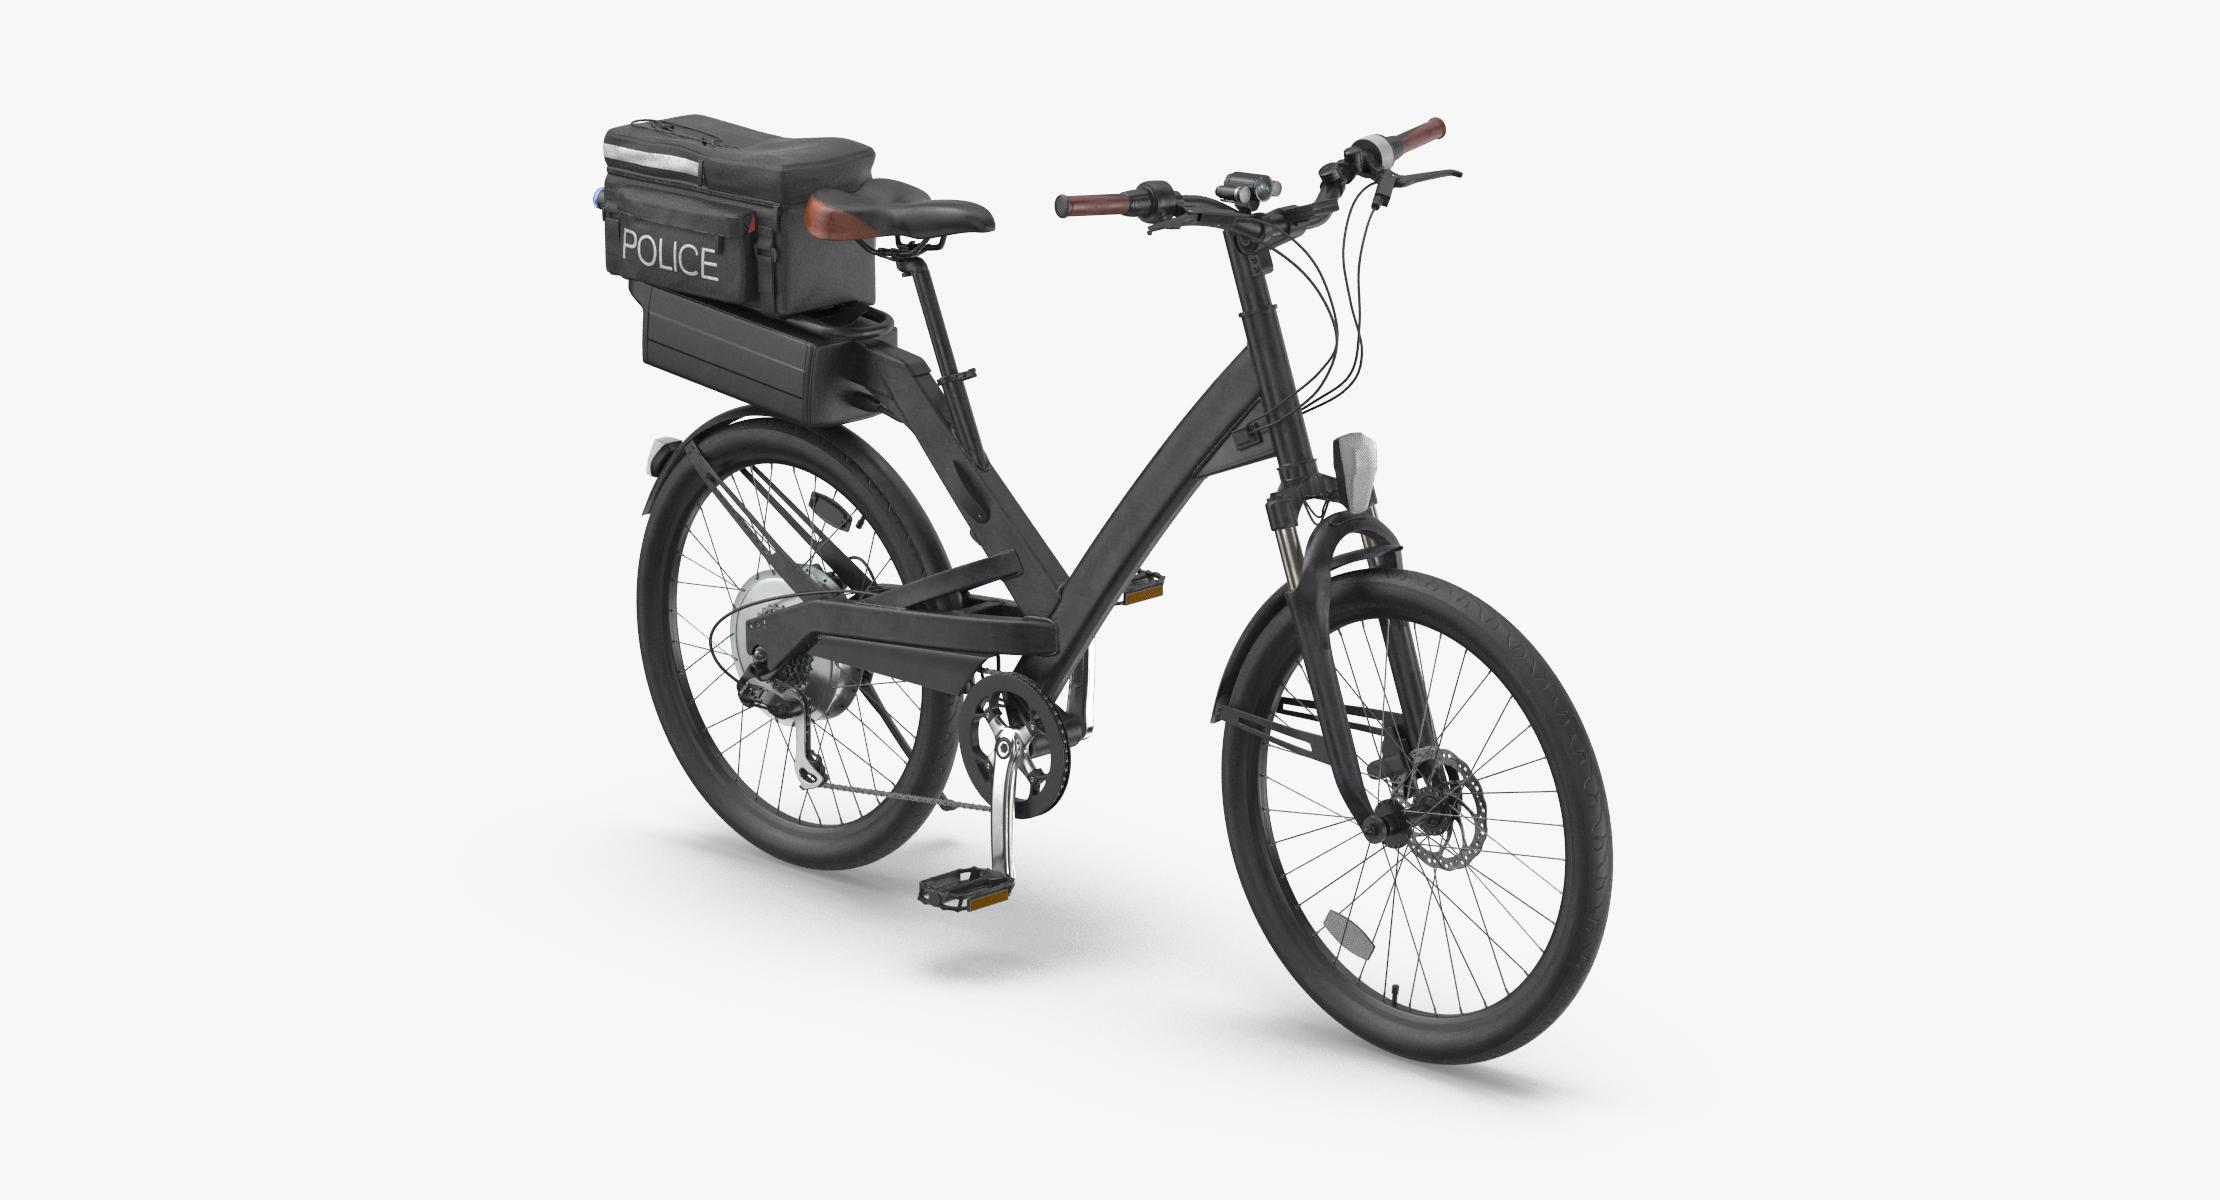 Police Bike Rigged - reel 1